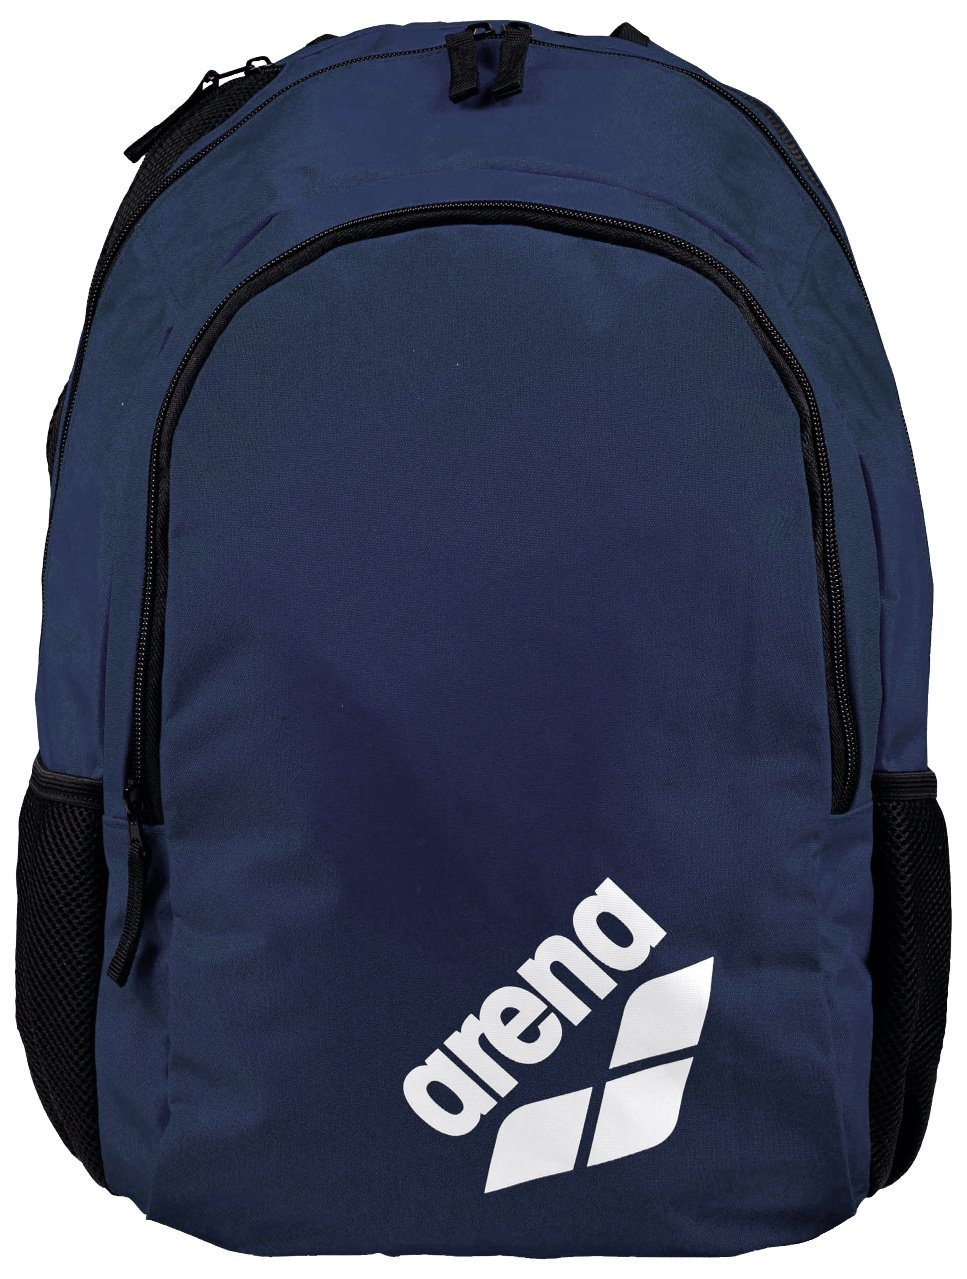 arena Spiky 2 Swim Backpack, Navy Team